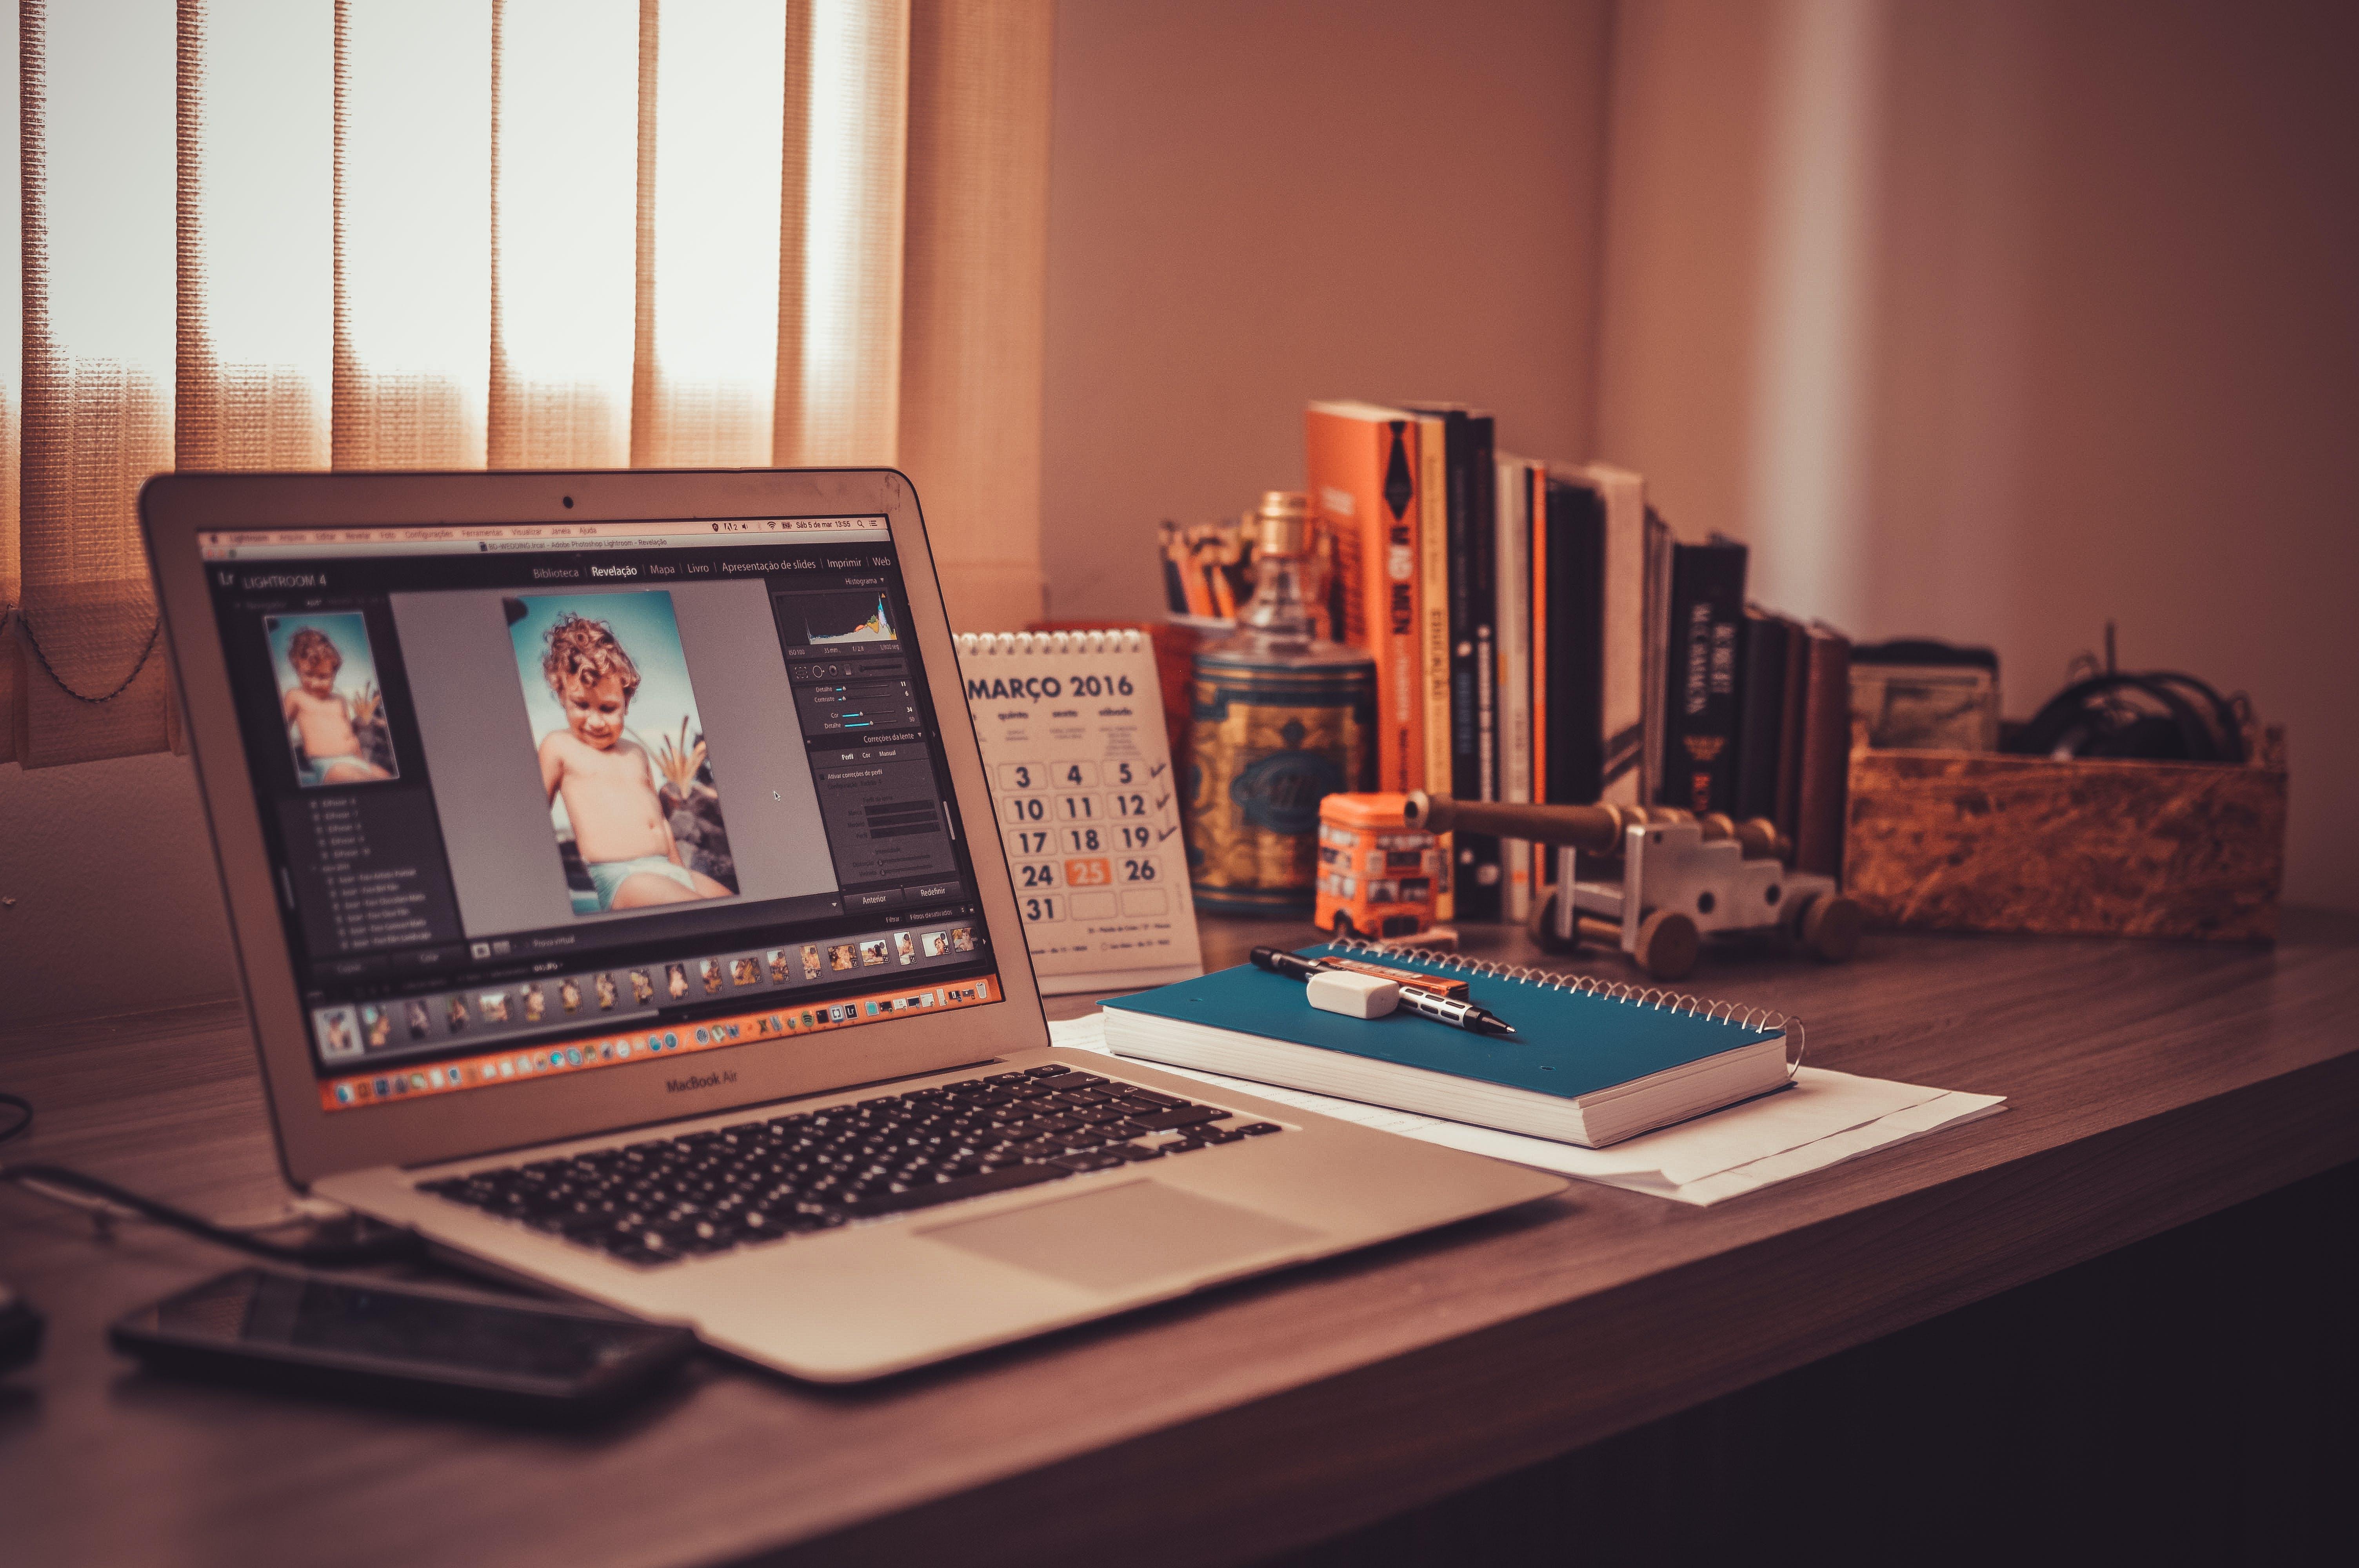 Adobe Photoshop, apple, blok